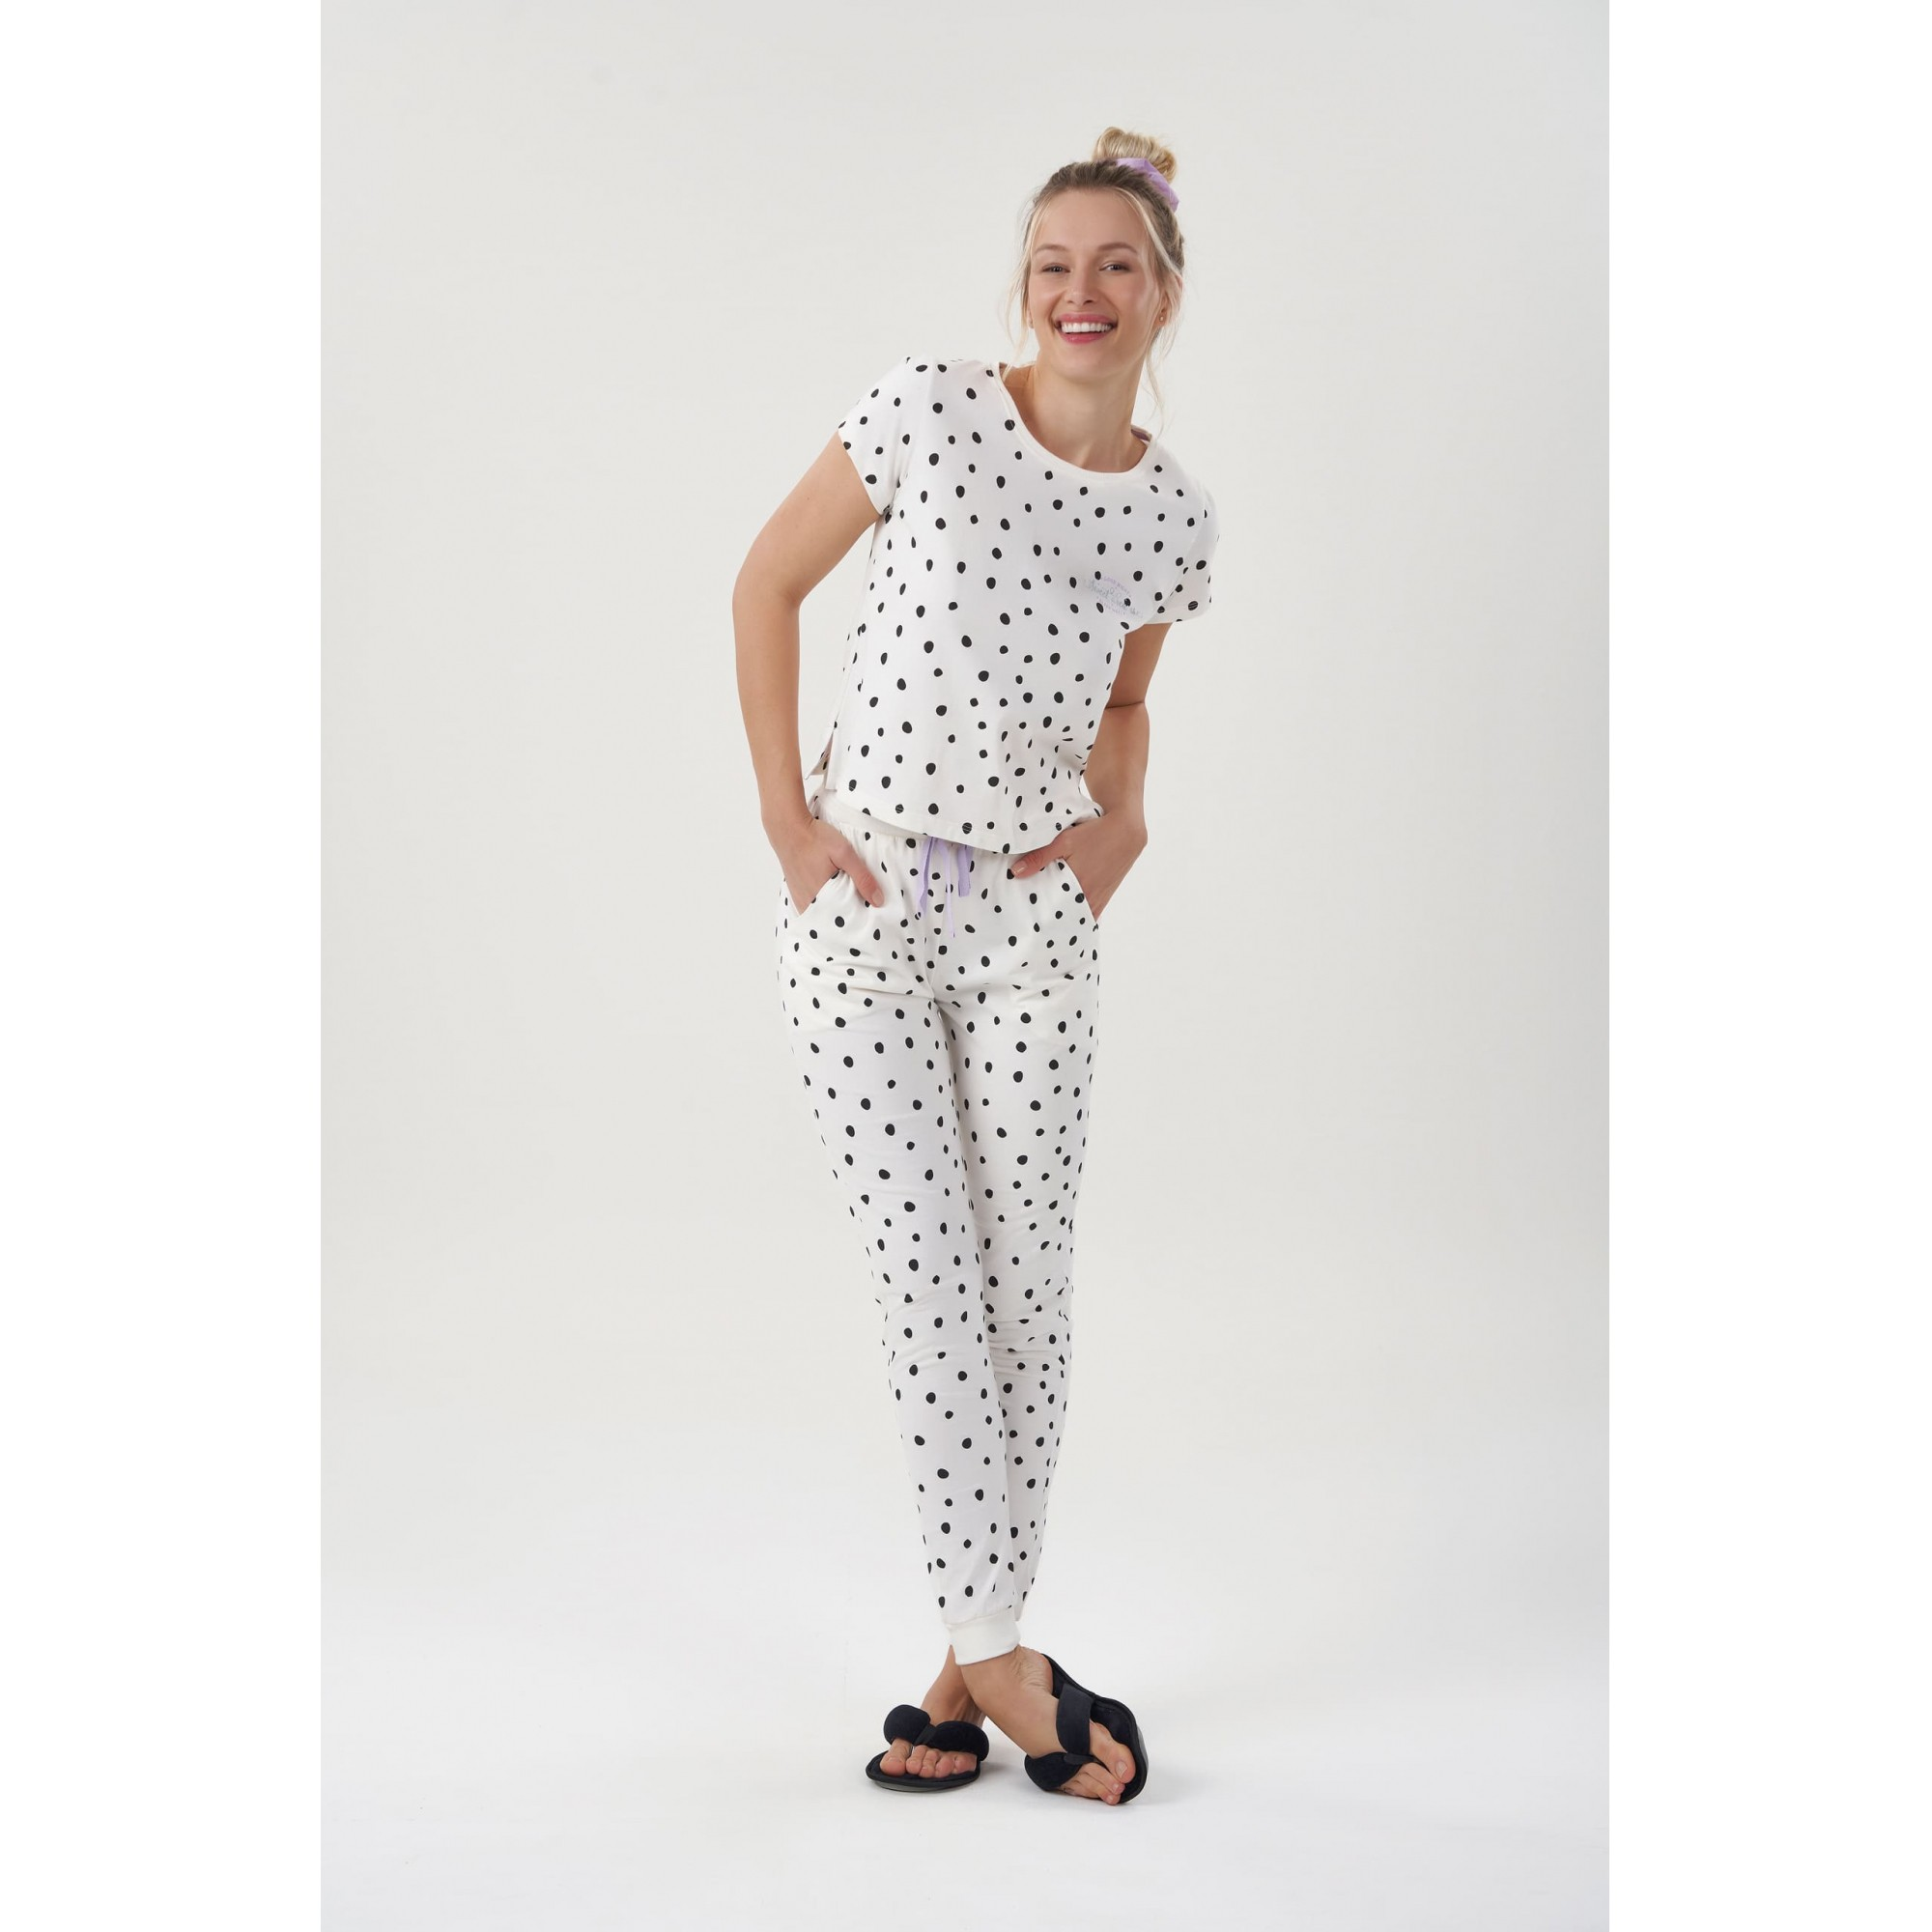 Pijama Calça e Manga Curta Feminino